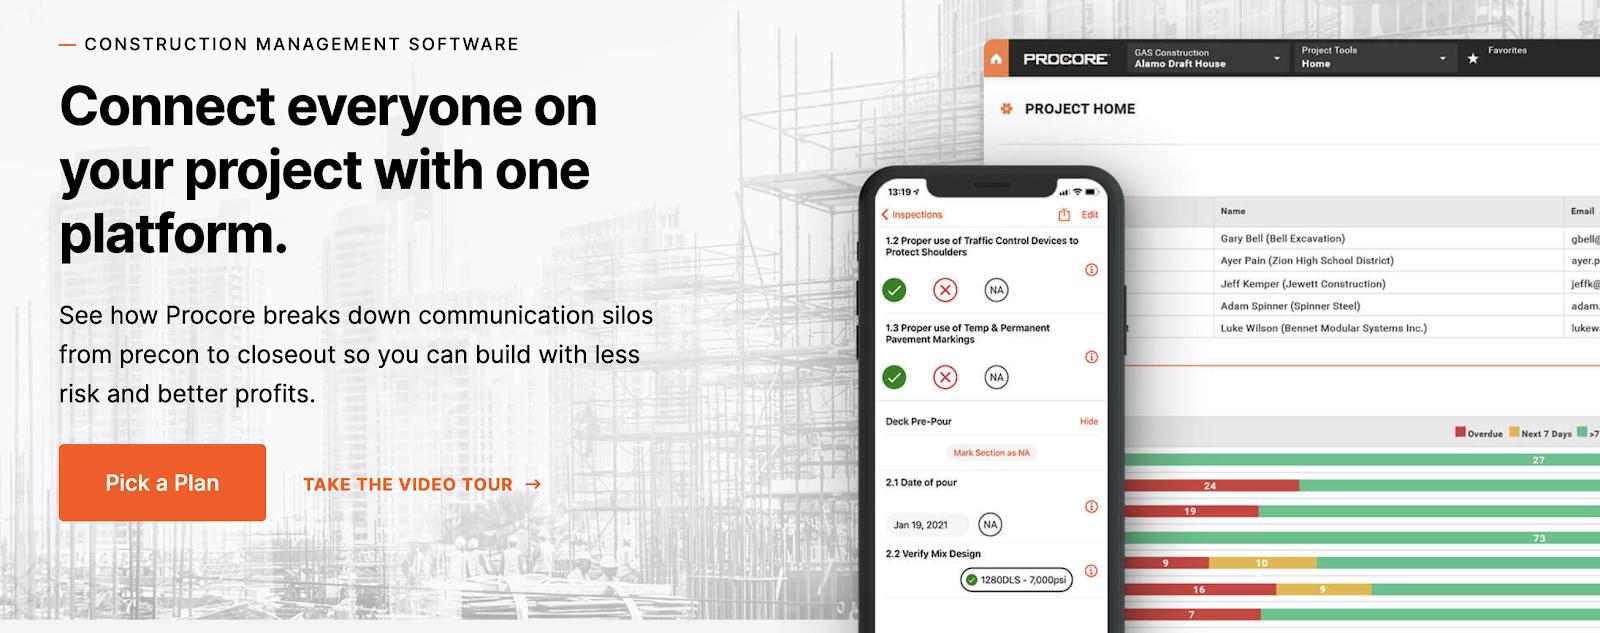 image showing Procore, a construction management software landing page